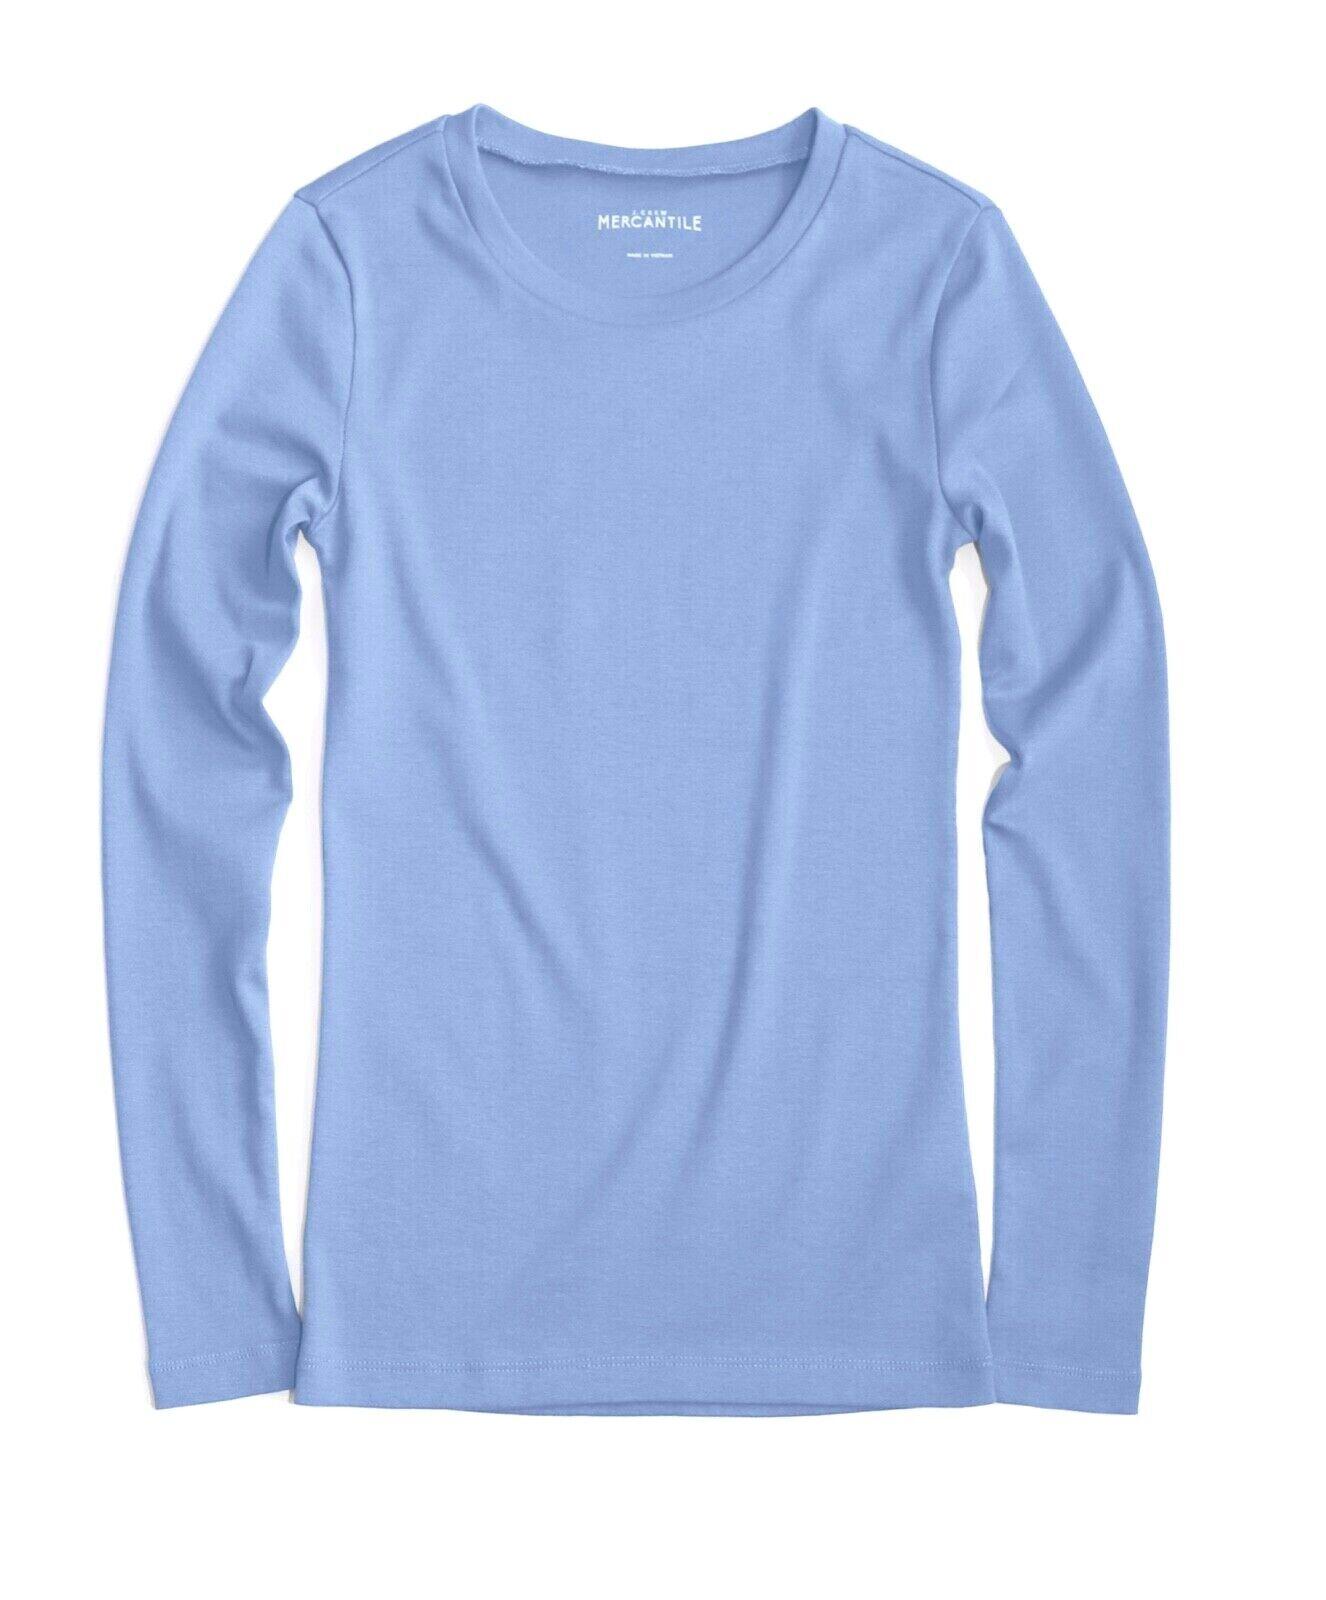 J.Crew Mercantile DAMEN XXL - Nwt Immergrün Blau Angepasst Angepasst Angepasst Langärmlig Baumwolle | New Listing  | Online-Shop  | Sale Outlet  | Internationale Wahl  | Deutsche Outlets  b136cc